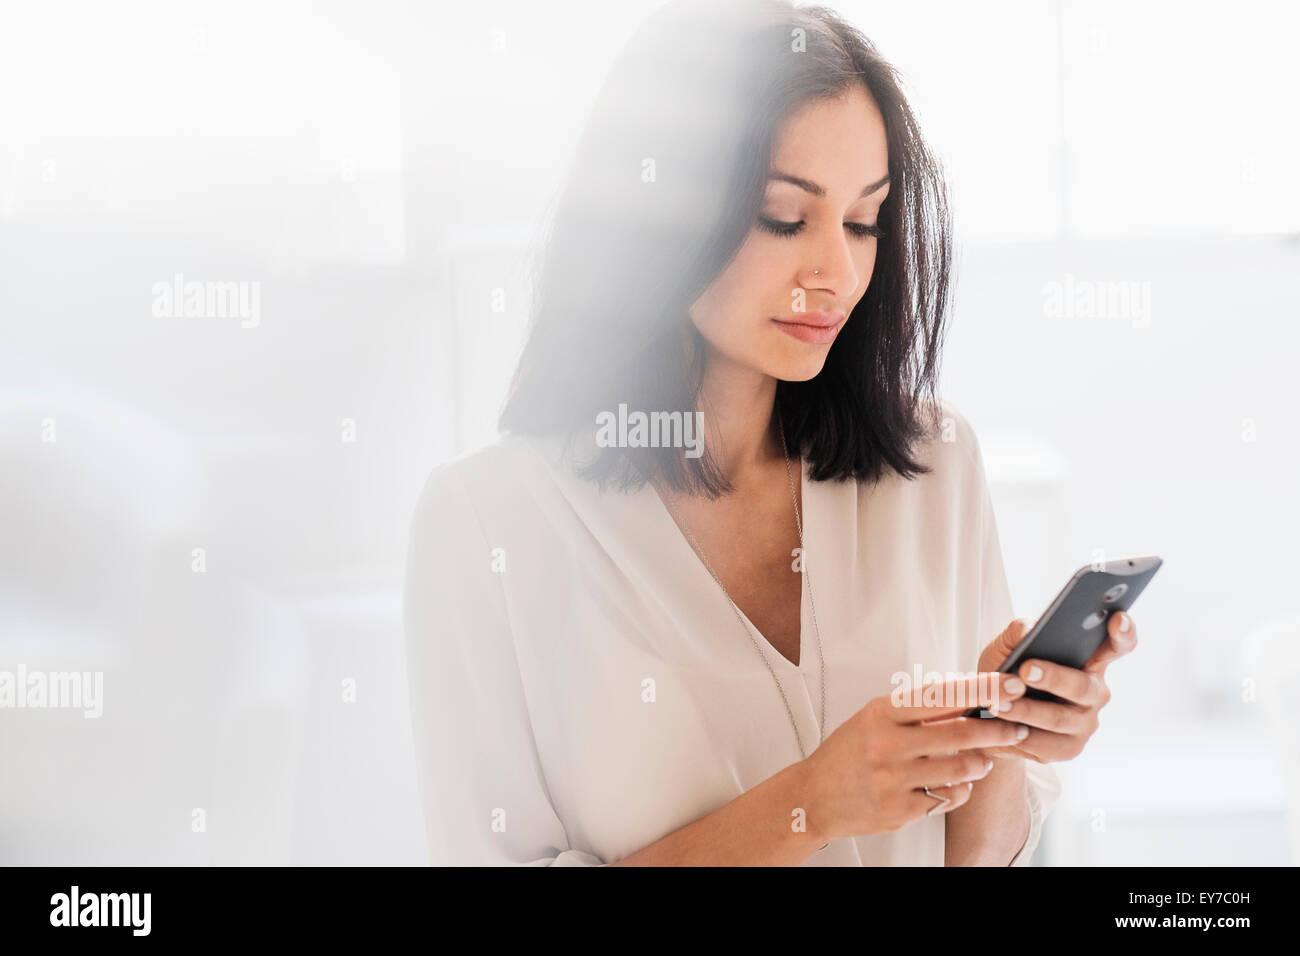 Frau mit Smartphone Stockbild